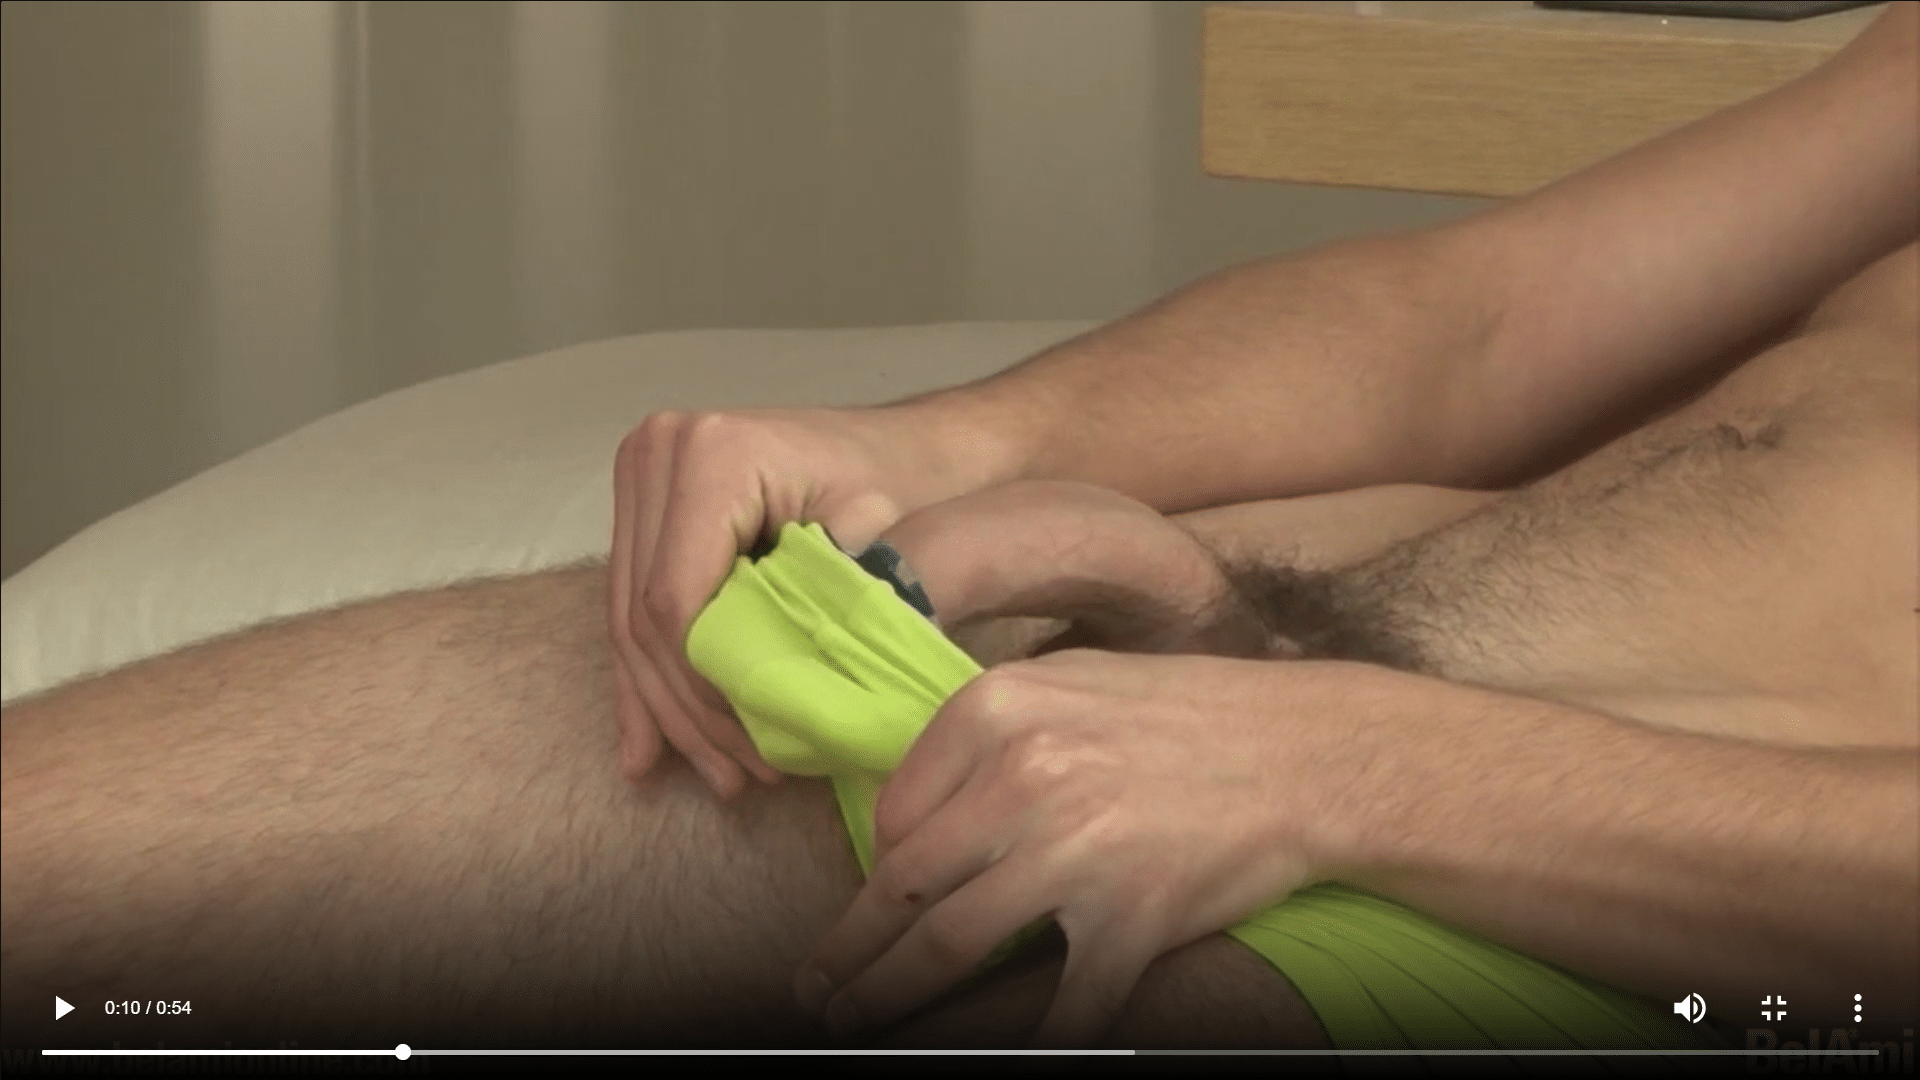 Newbie-Belami-boy-Jules-Bourget-strokes-stubby-thick-uncut-dick-spraying-jizz-six-pack-abs-10-gay-porn-pics